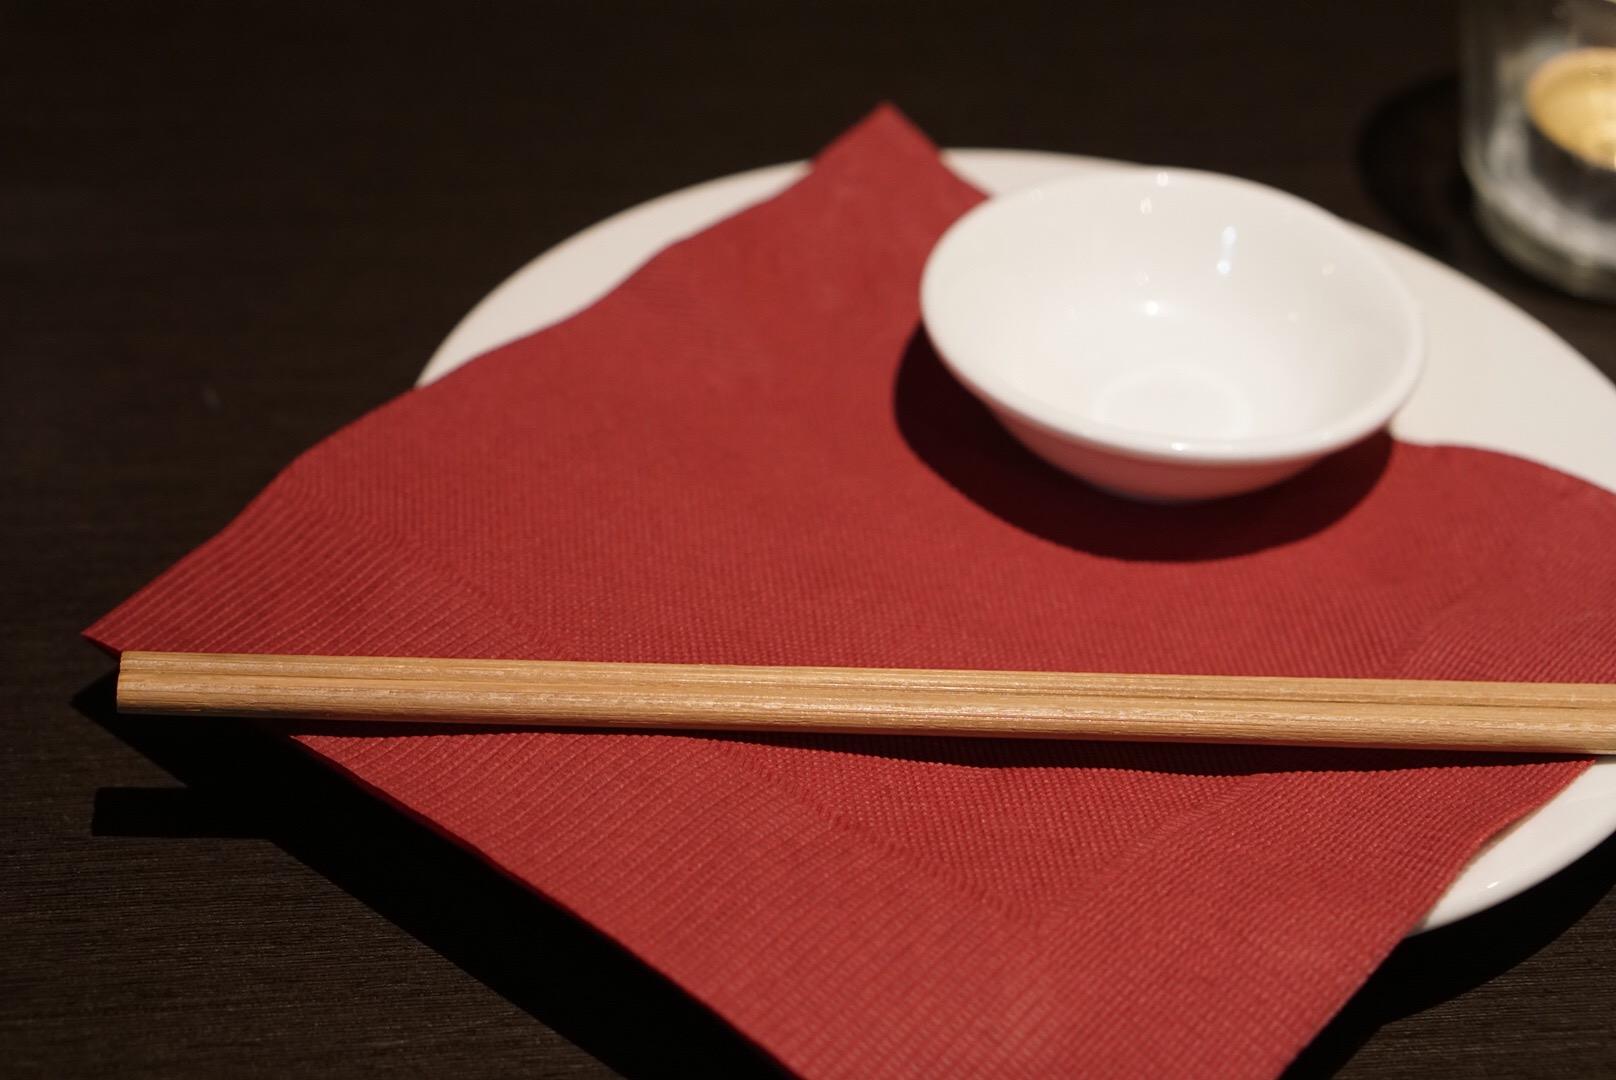 Toshiya, Japanese restaurants, at Cremorne